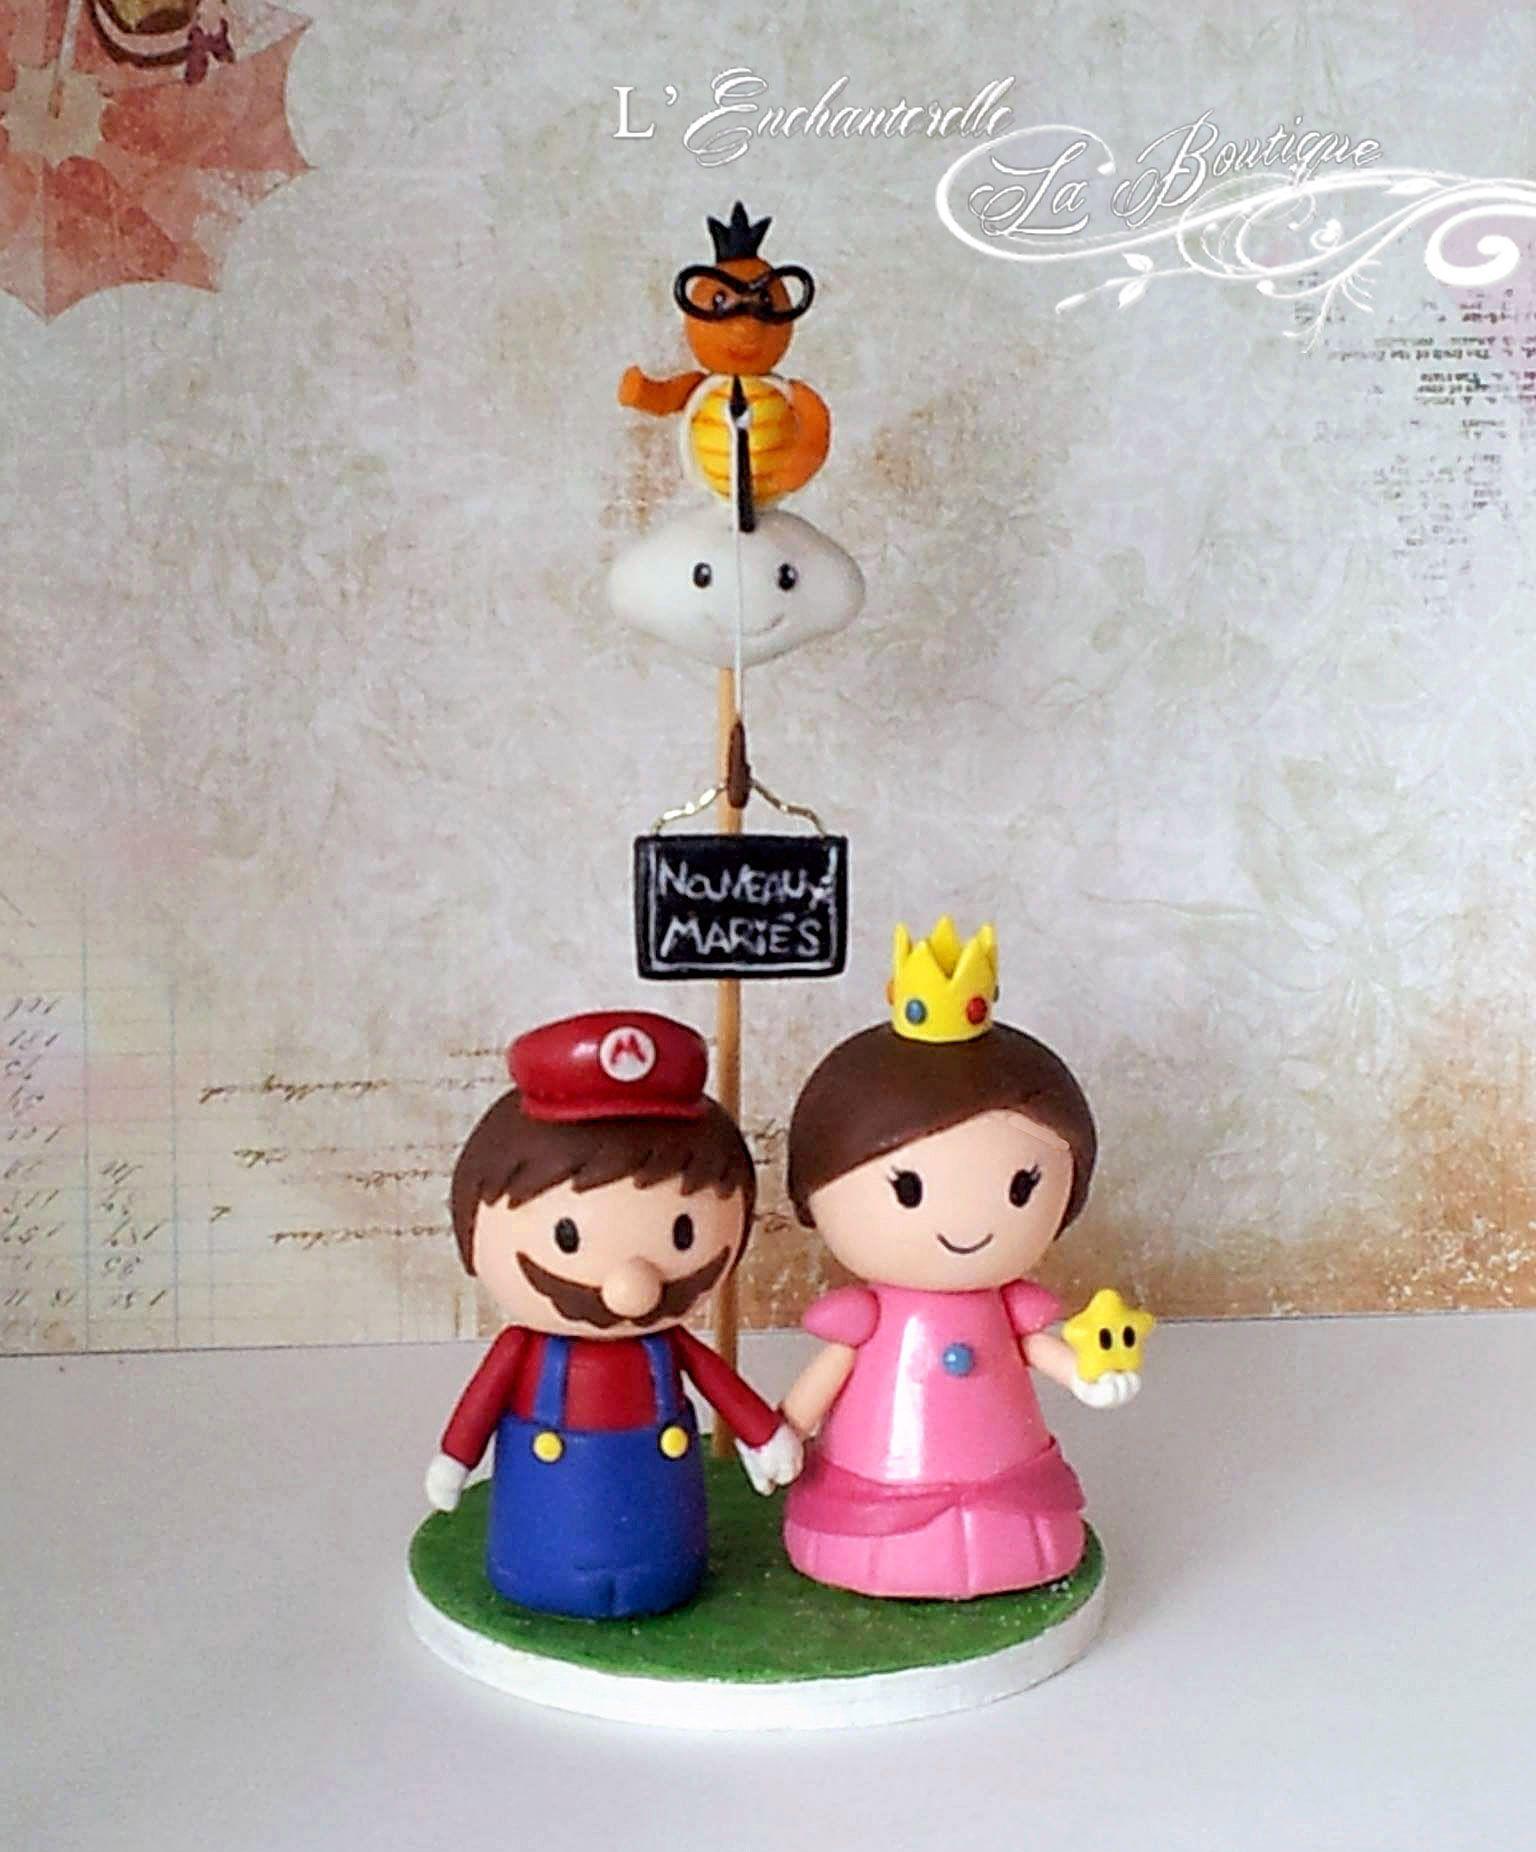 Beautiful Mario Wedding Cake Topper Ornament - The Wedding Ideas ...